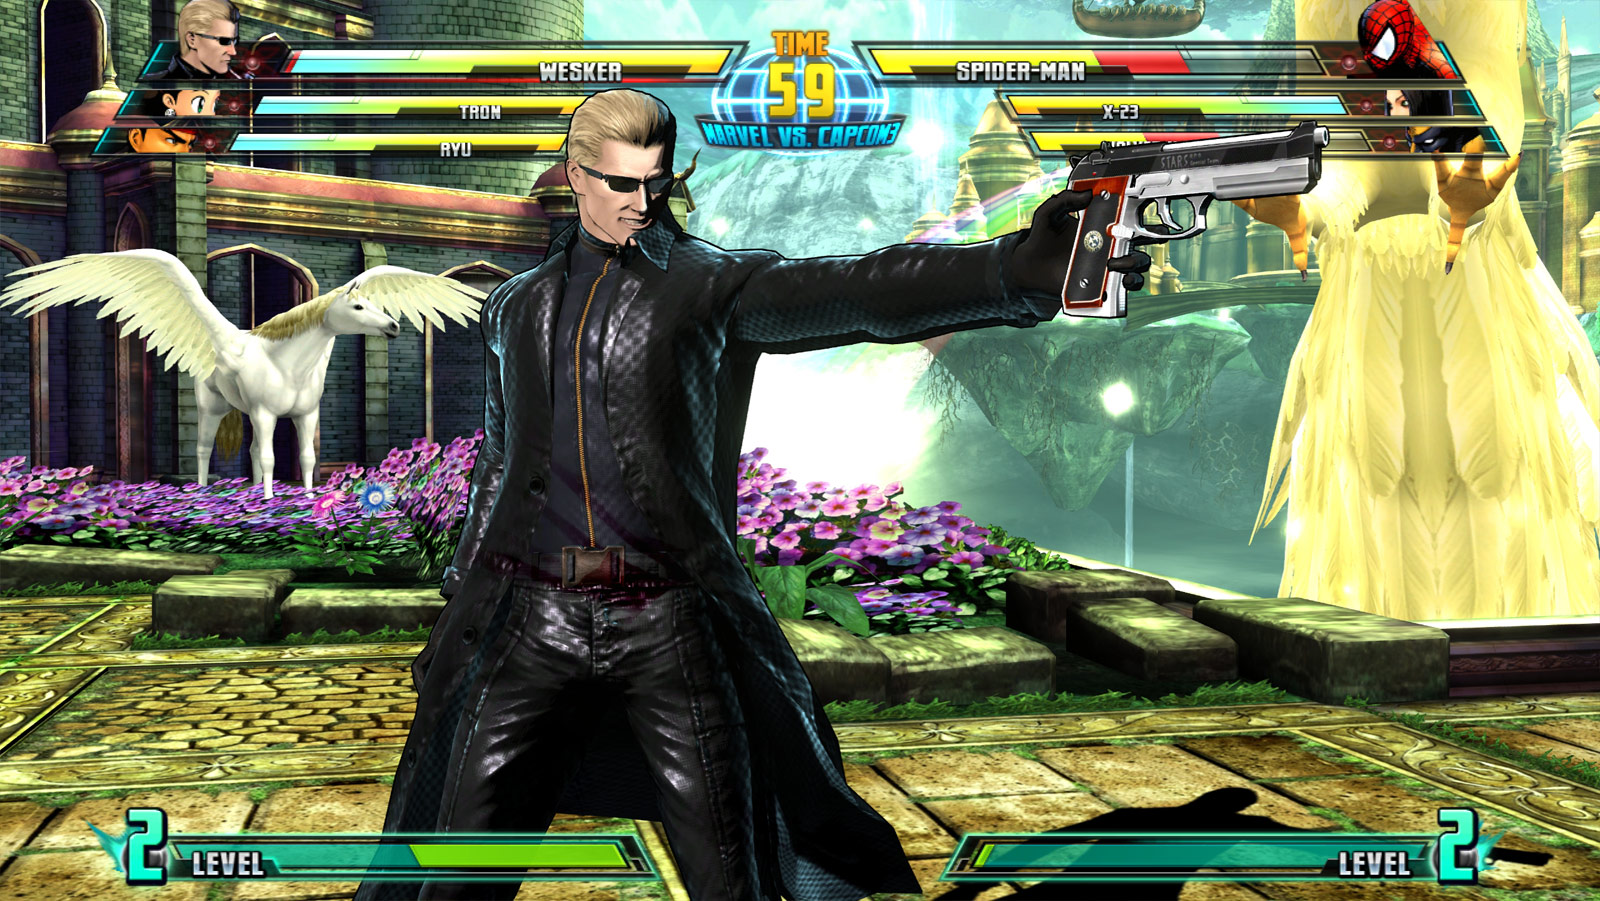 Marvel vs. Capcom 3 screen shot Sept. 21 image #2